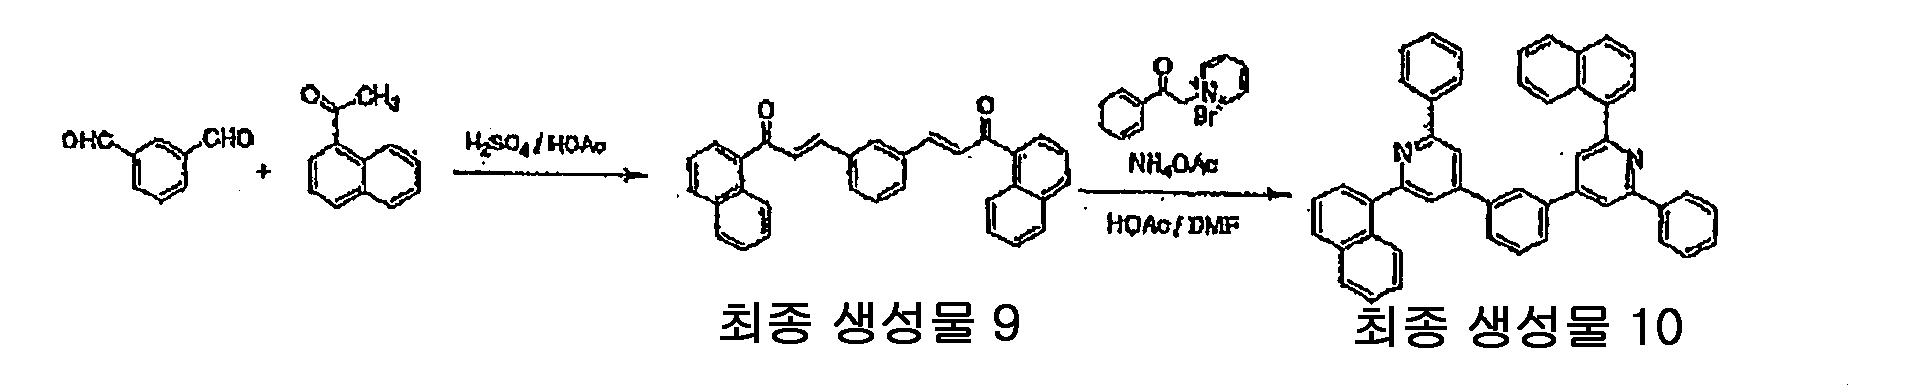 Figure 112010002231902-pat00106